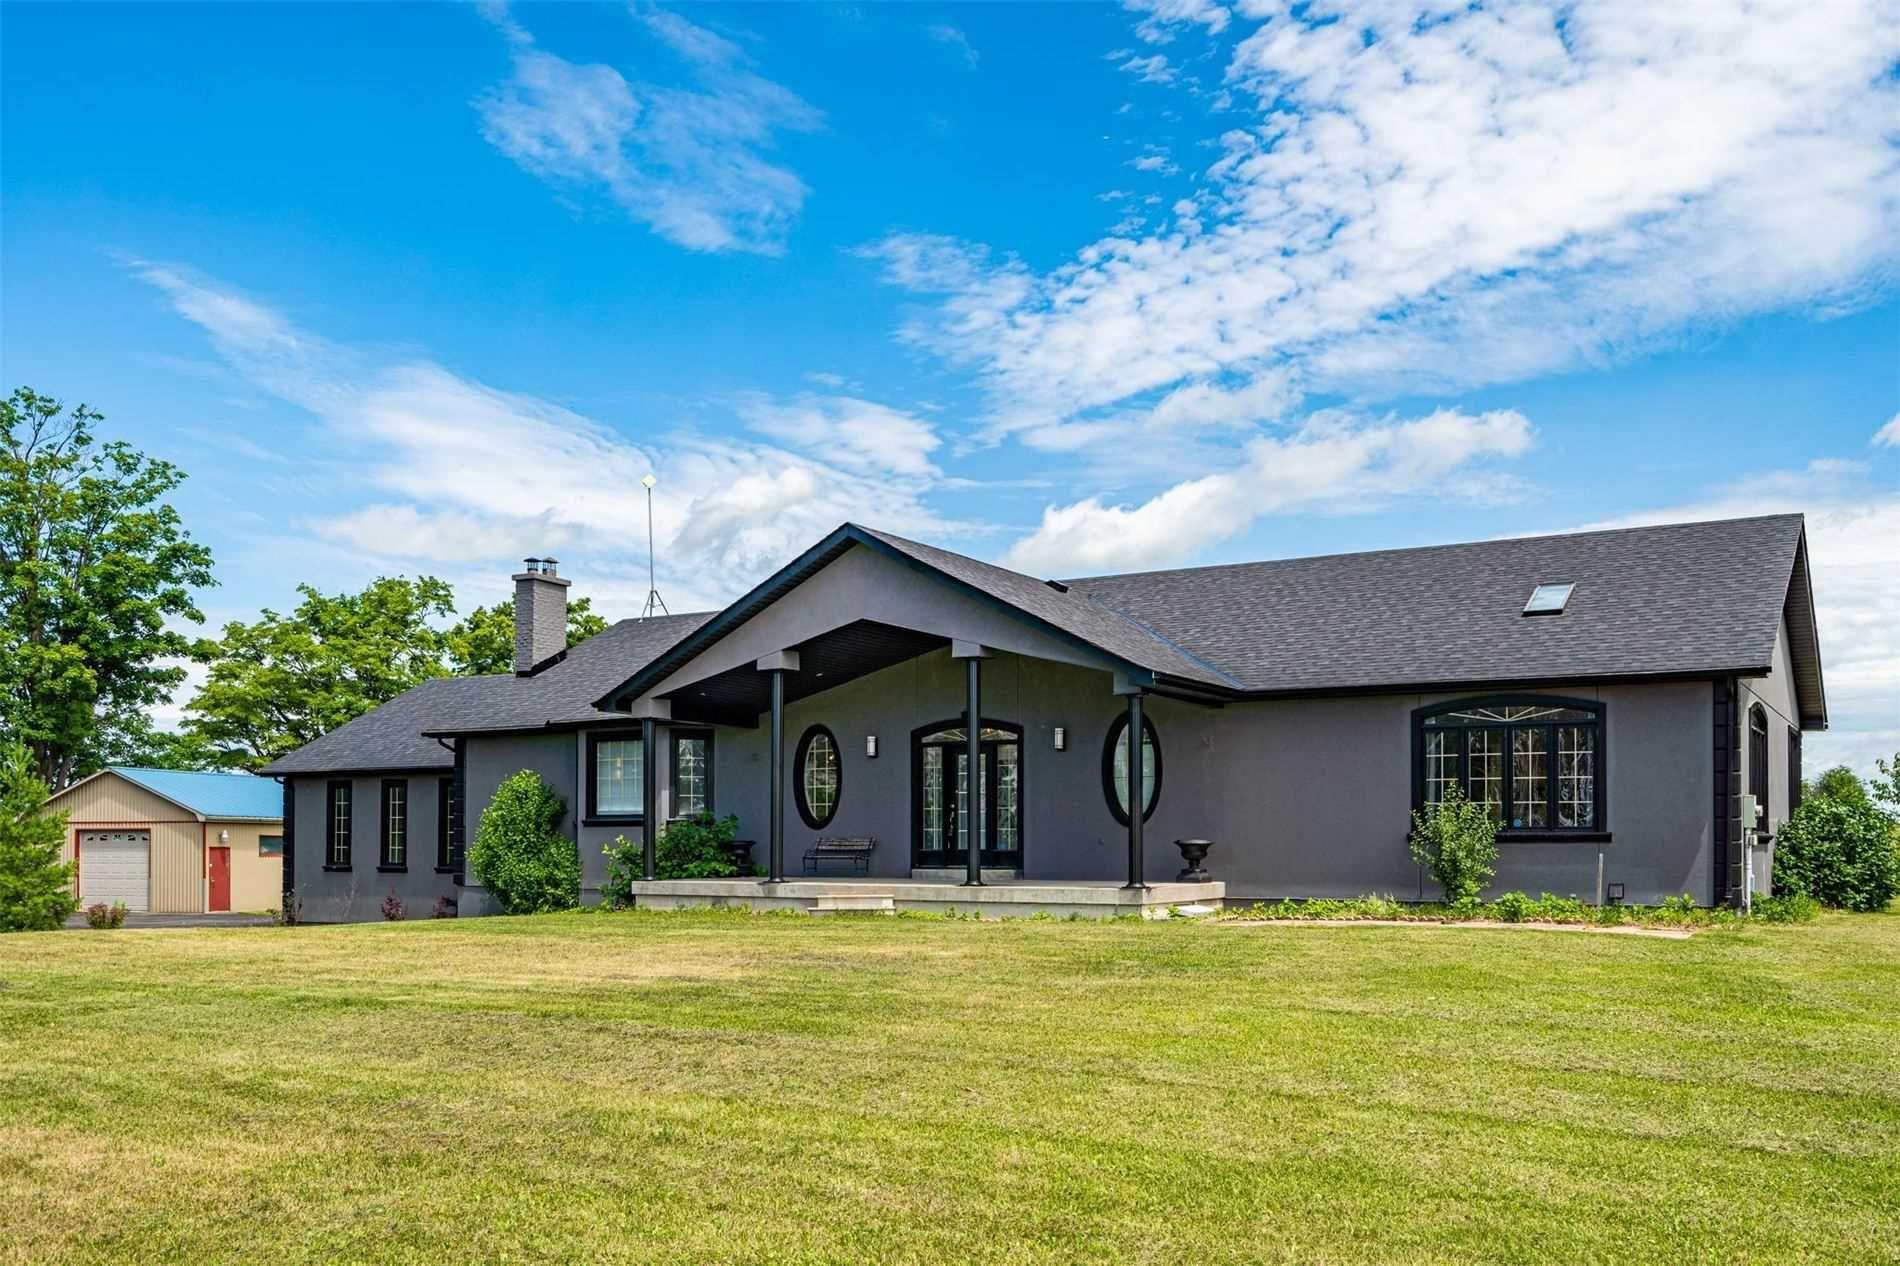 Main Photo: 232319 Trafalgar Road in East Garafraxa: Rural East Garafraxa House (Bungalow) for sale : MLS®# X4840979